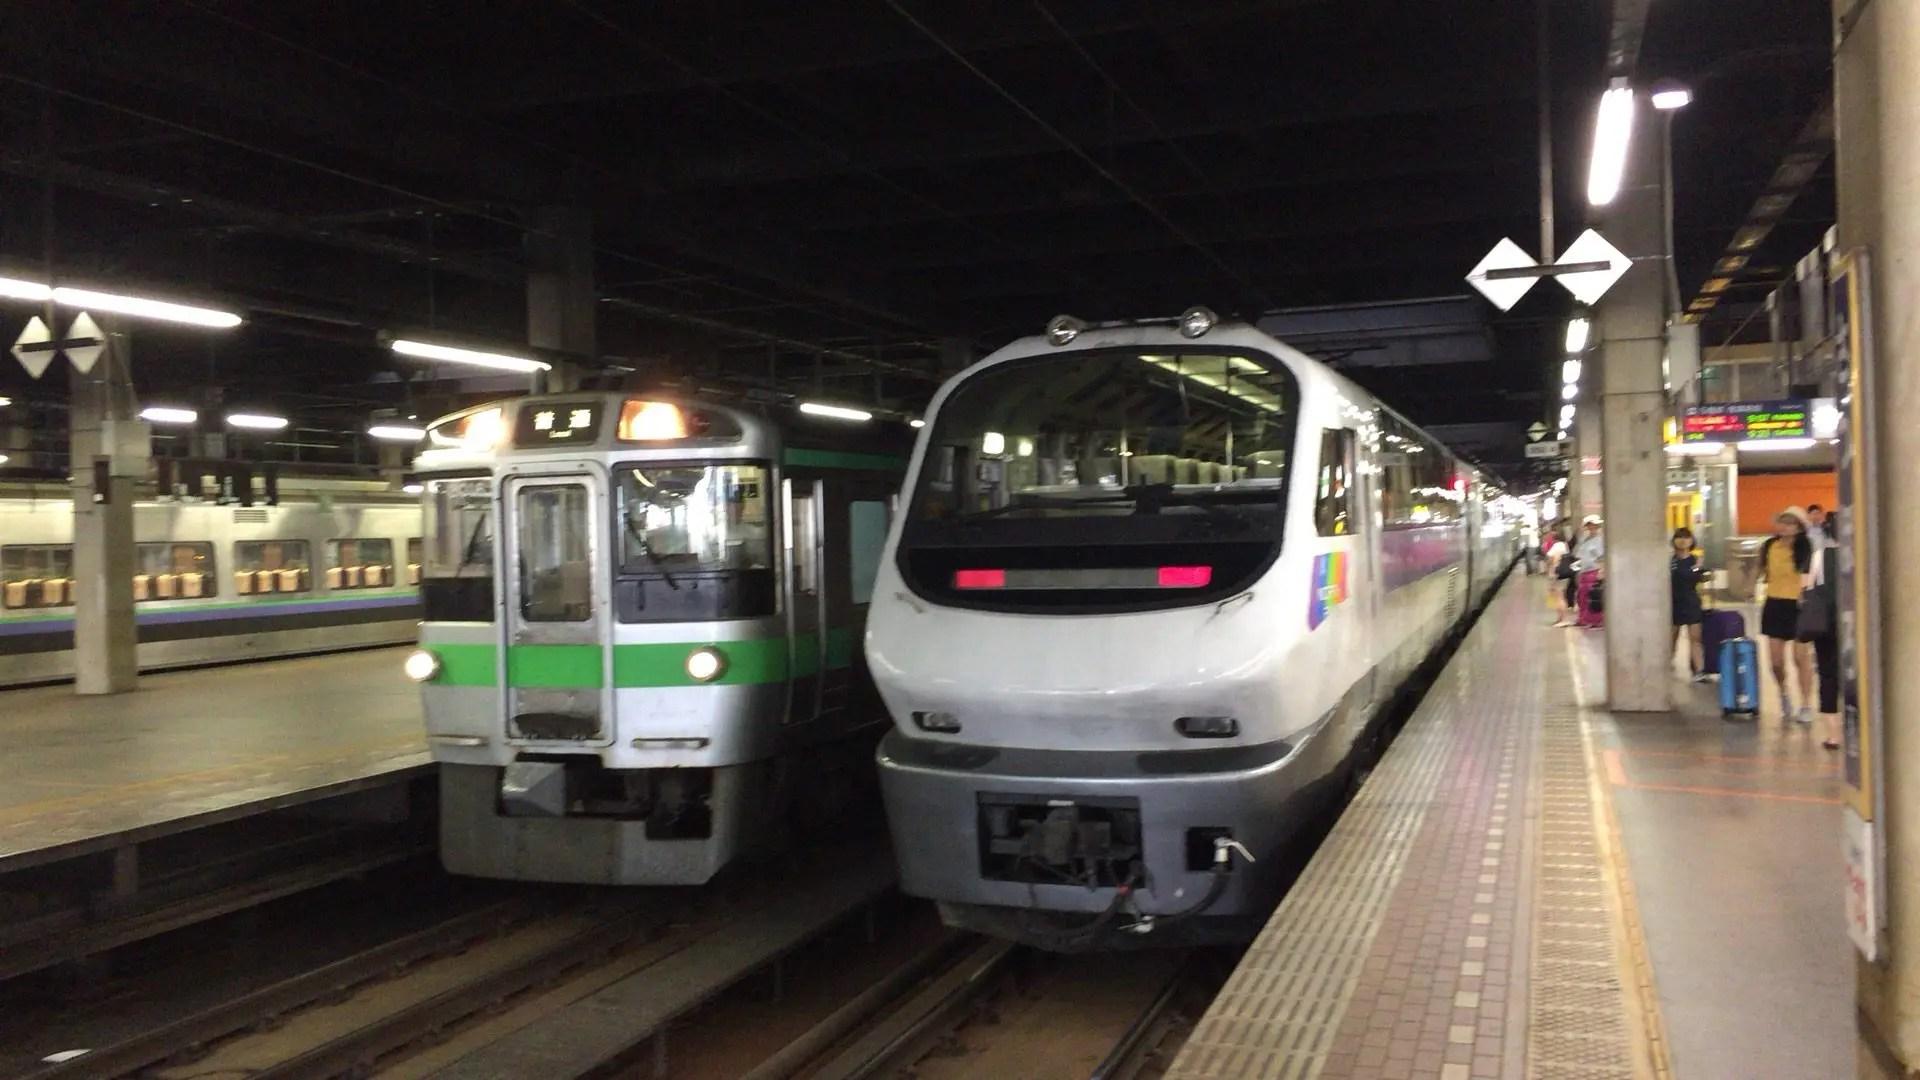 JR北海道のフリーきっぷまとめ   akkiの鉄道旅行記